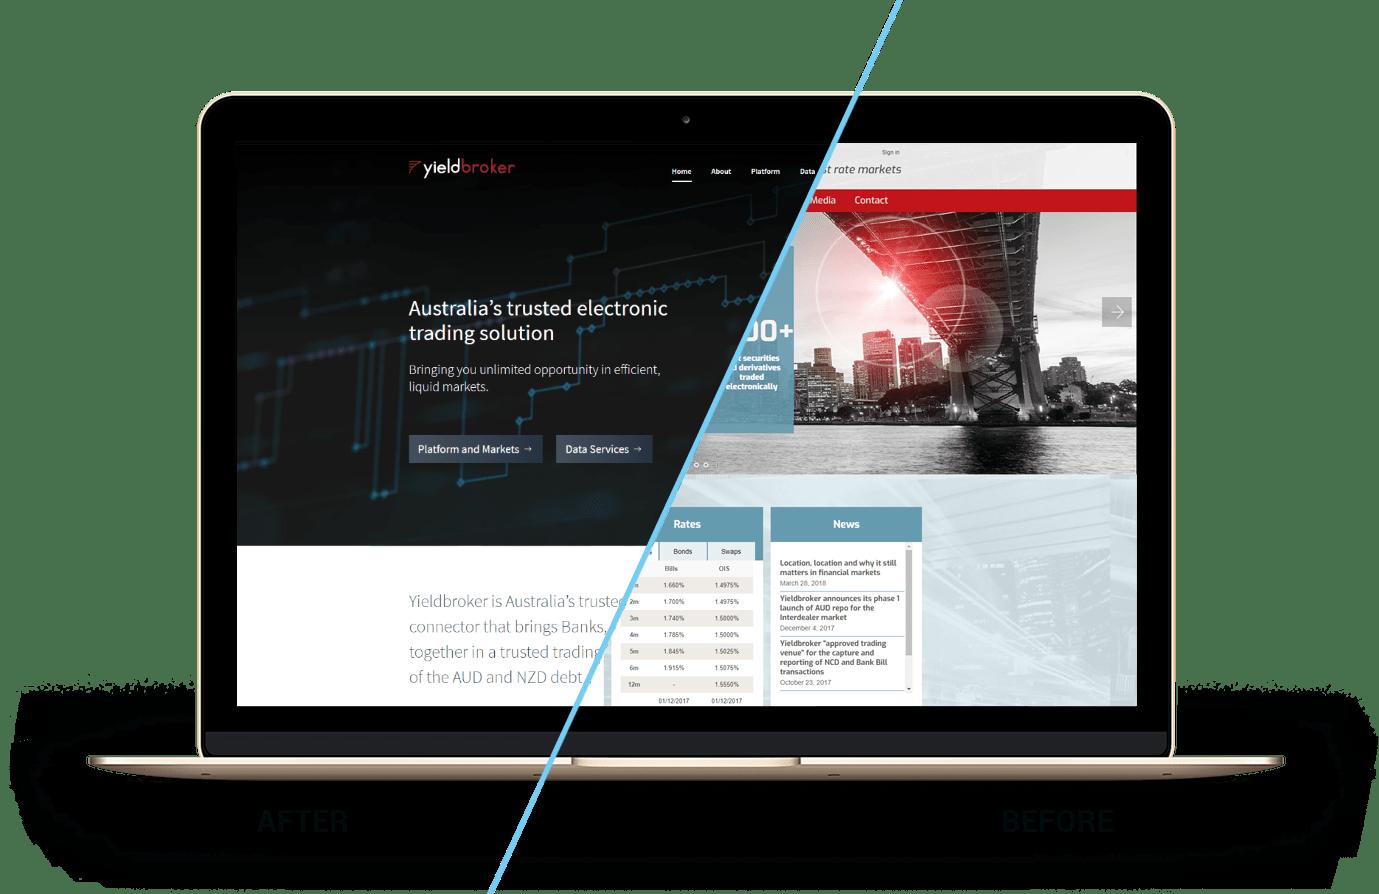 Desktop screen compare